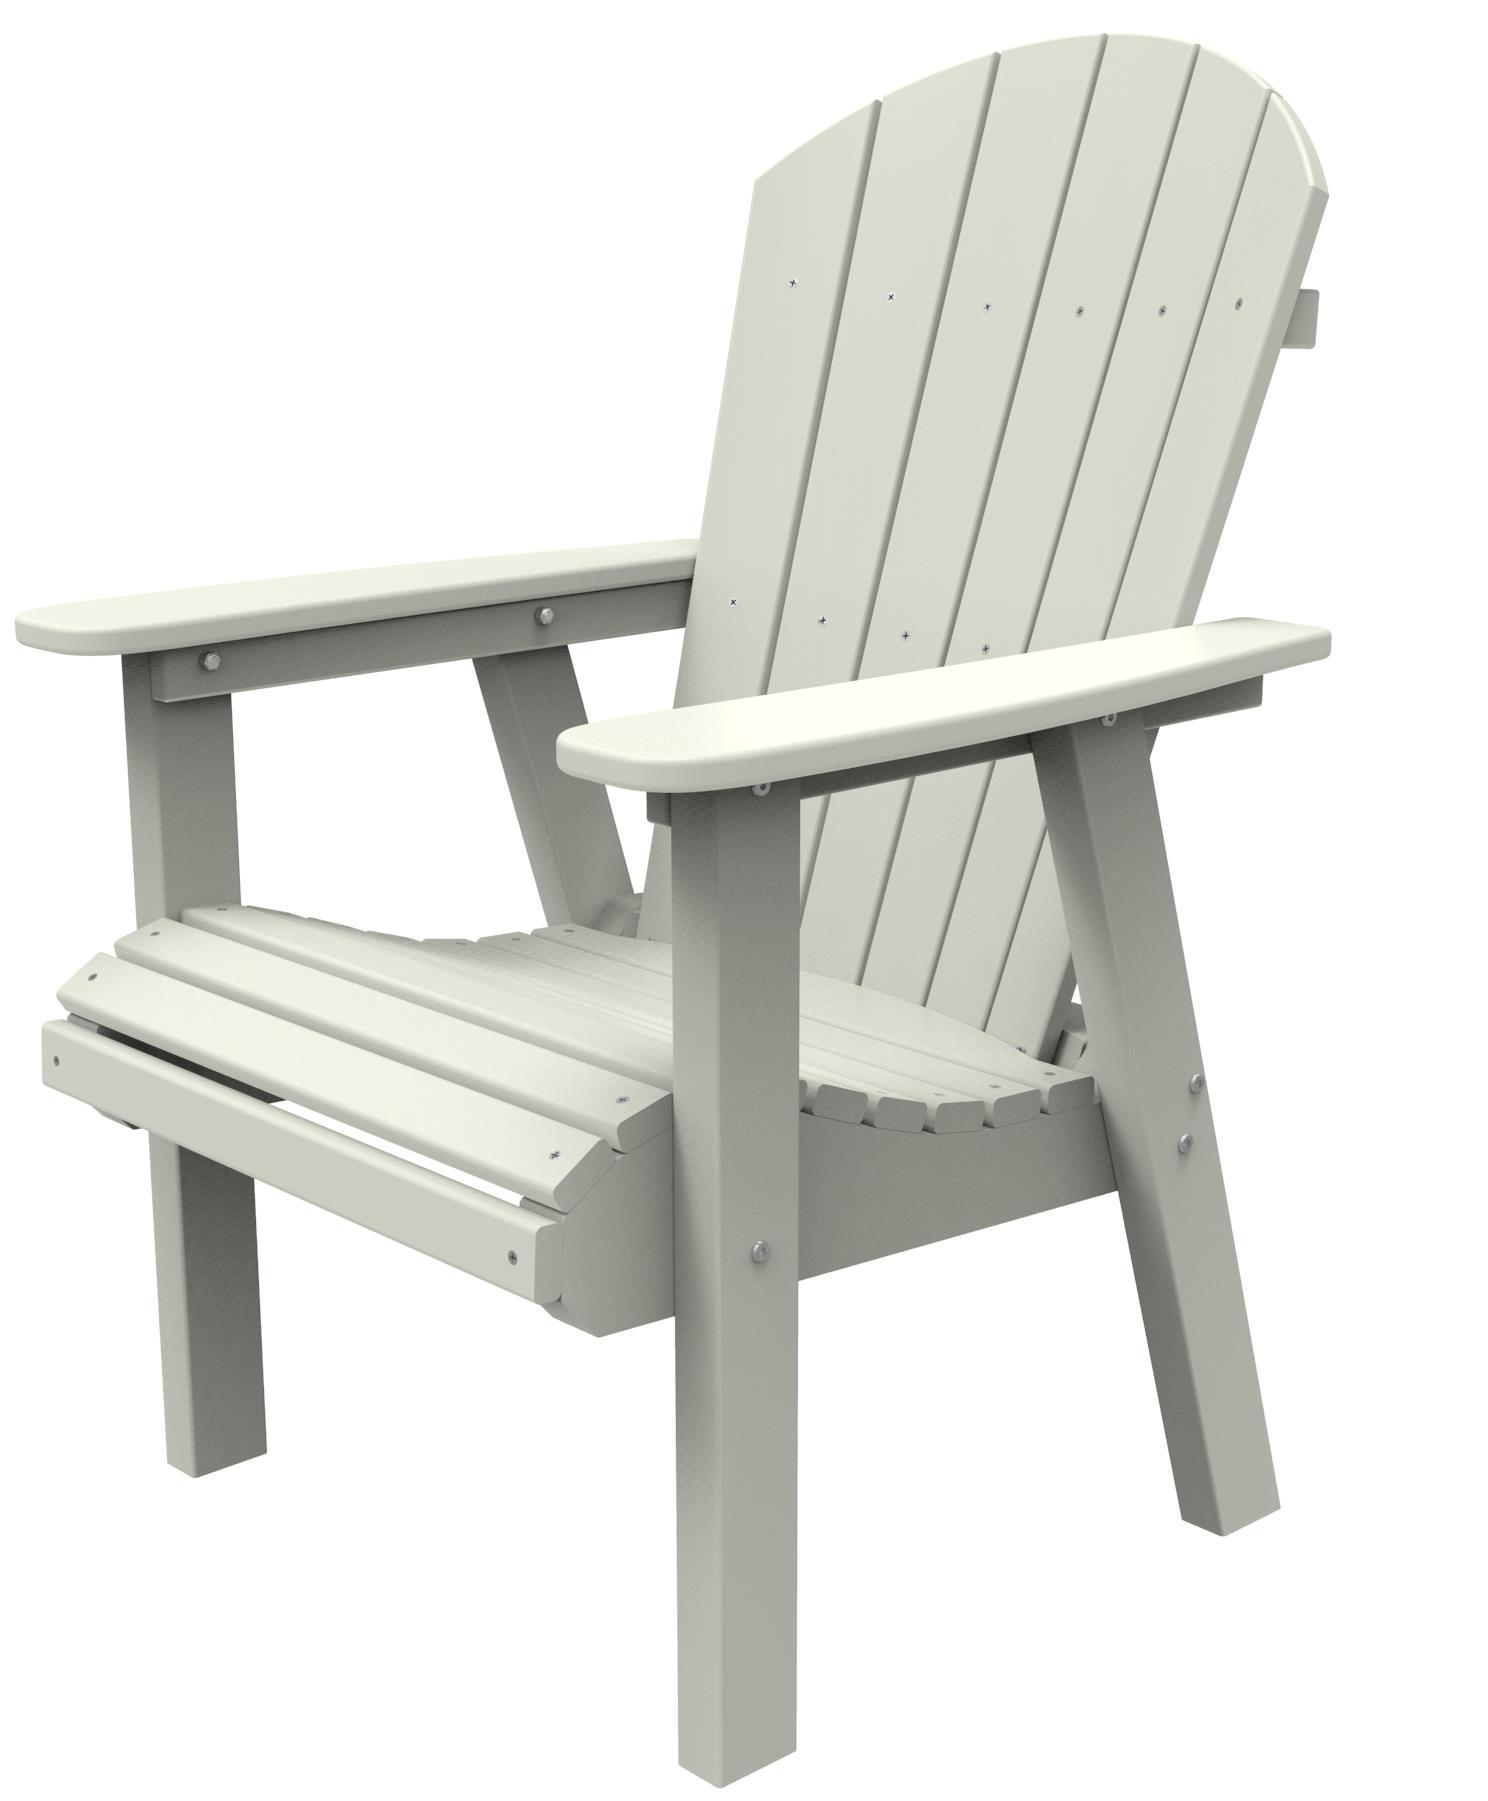 Malibu Outdoor Furniture Hyannis Dining Chair by Malibu Outdoor Living at Mueller Furniture